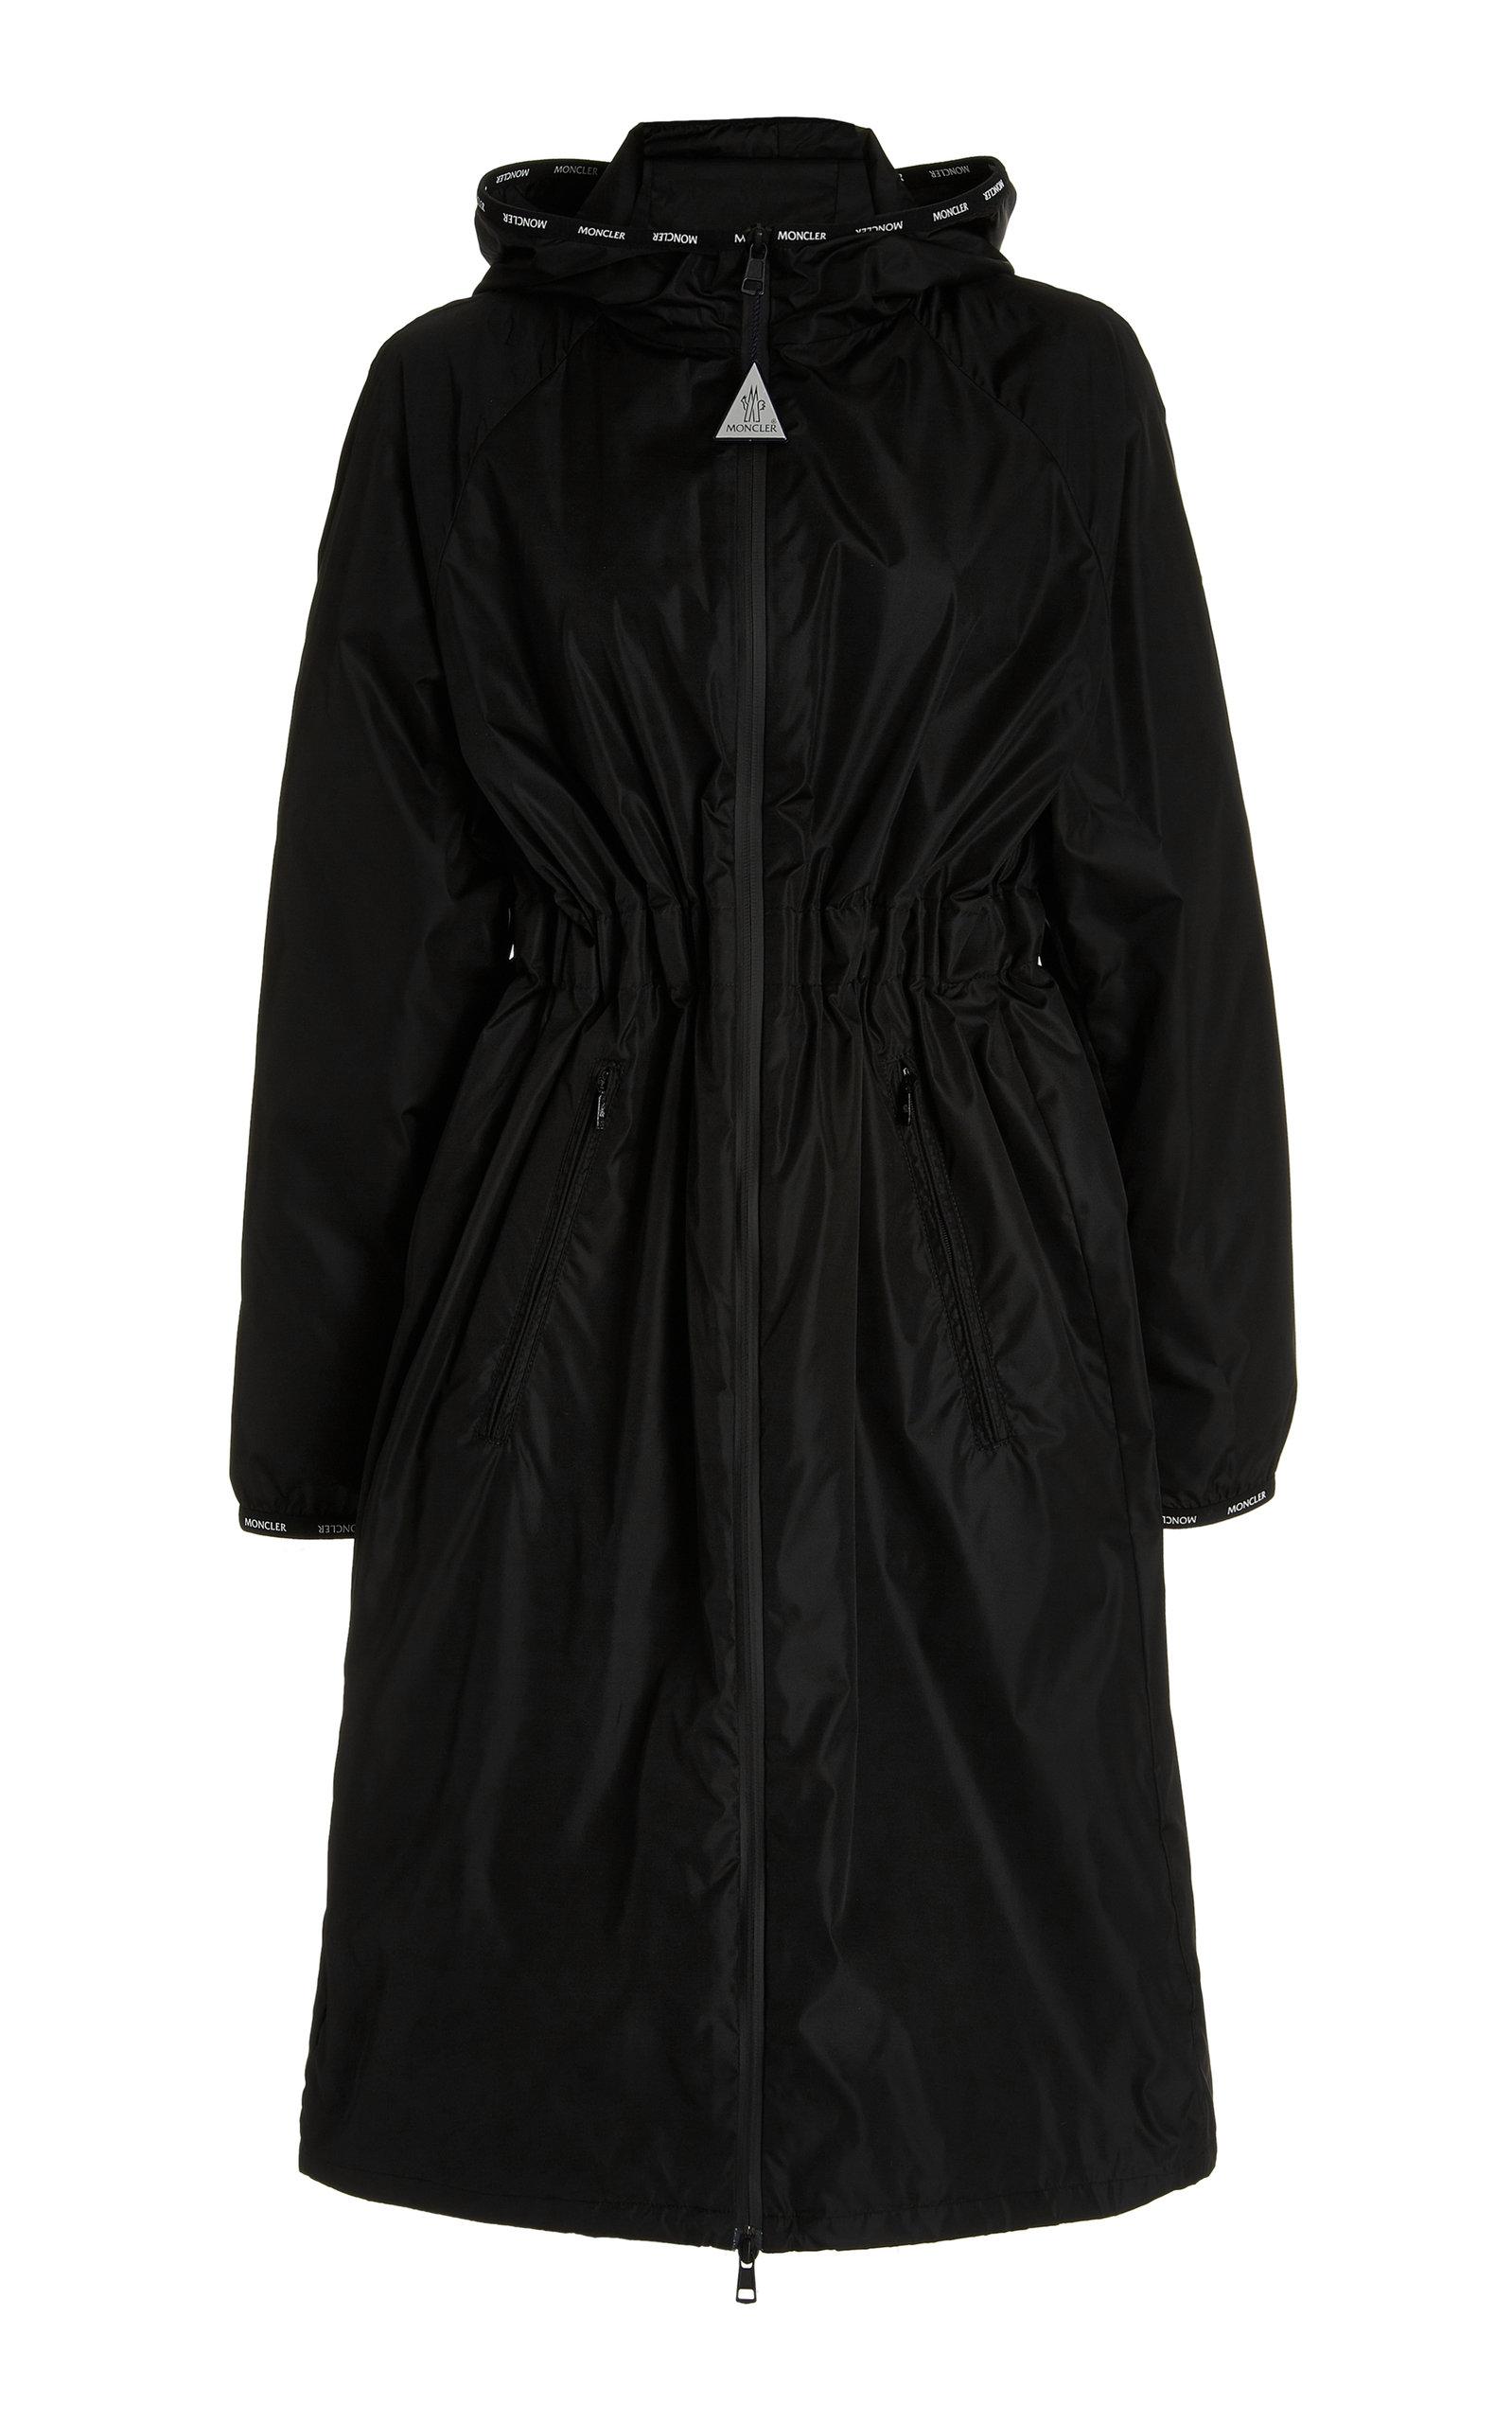 Moncler - Women's Rasaben Long Drawstring-Detailed Shell Jacket - Black - Moda Operandi